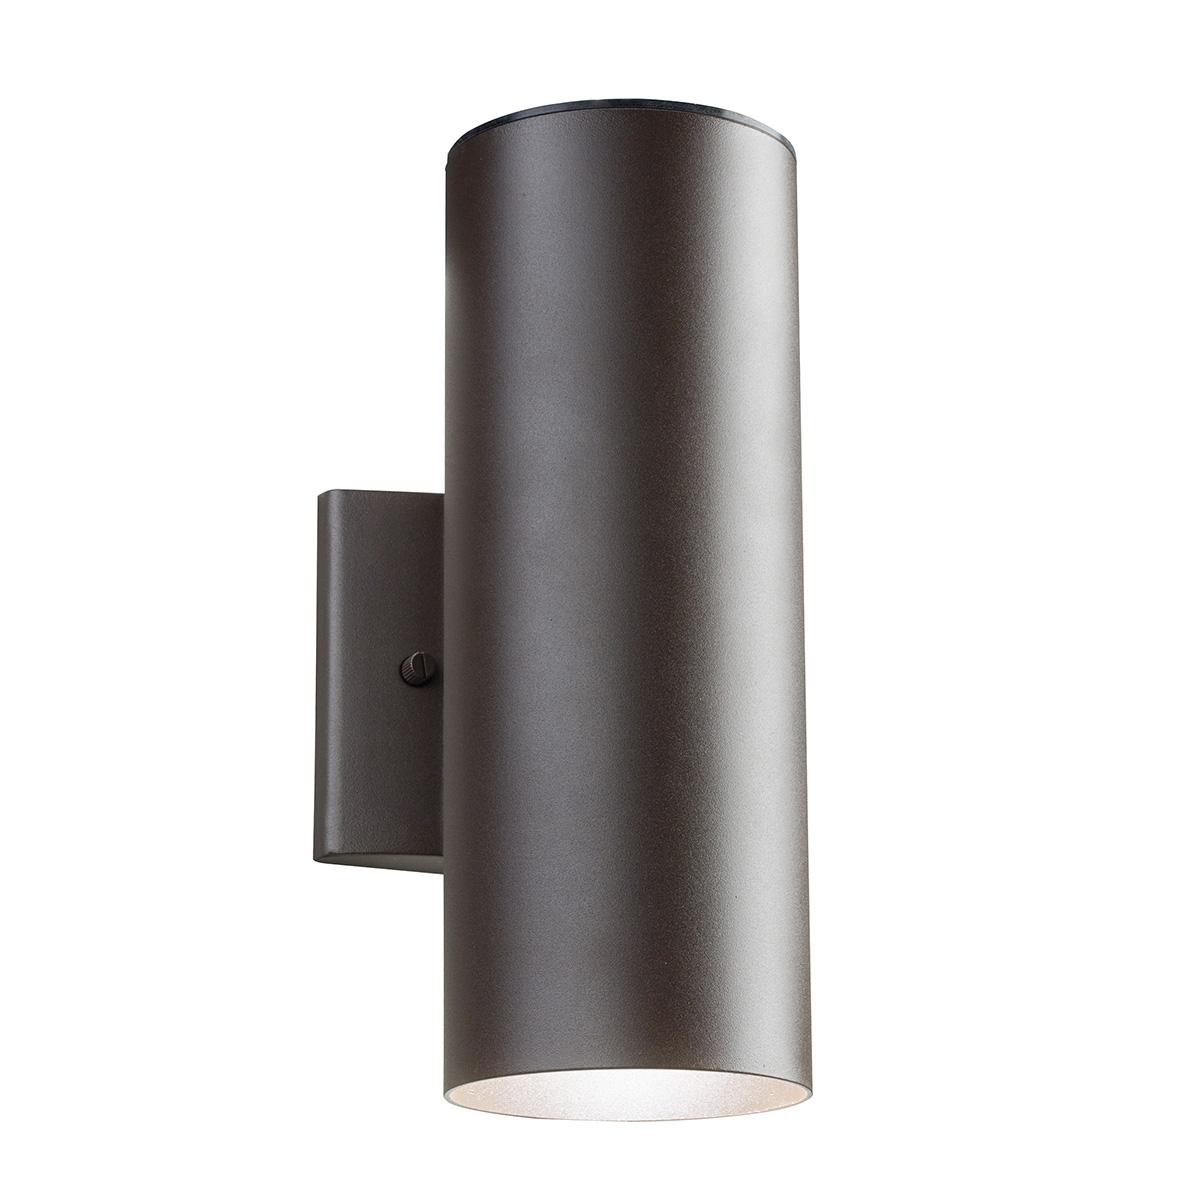 Bathroom Lights Point Up Or Down led outdoor up lighting | home decorating, interior design, bath